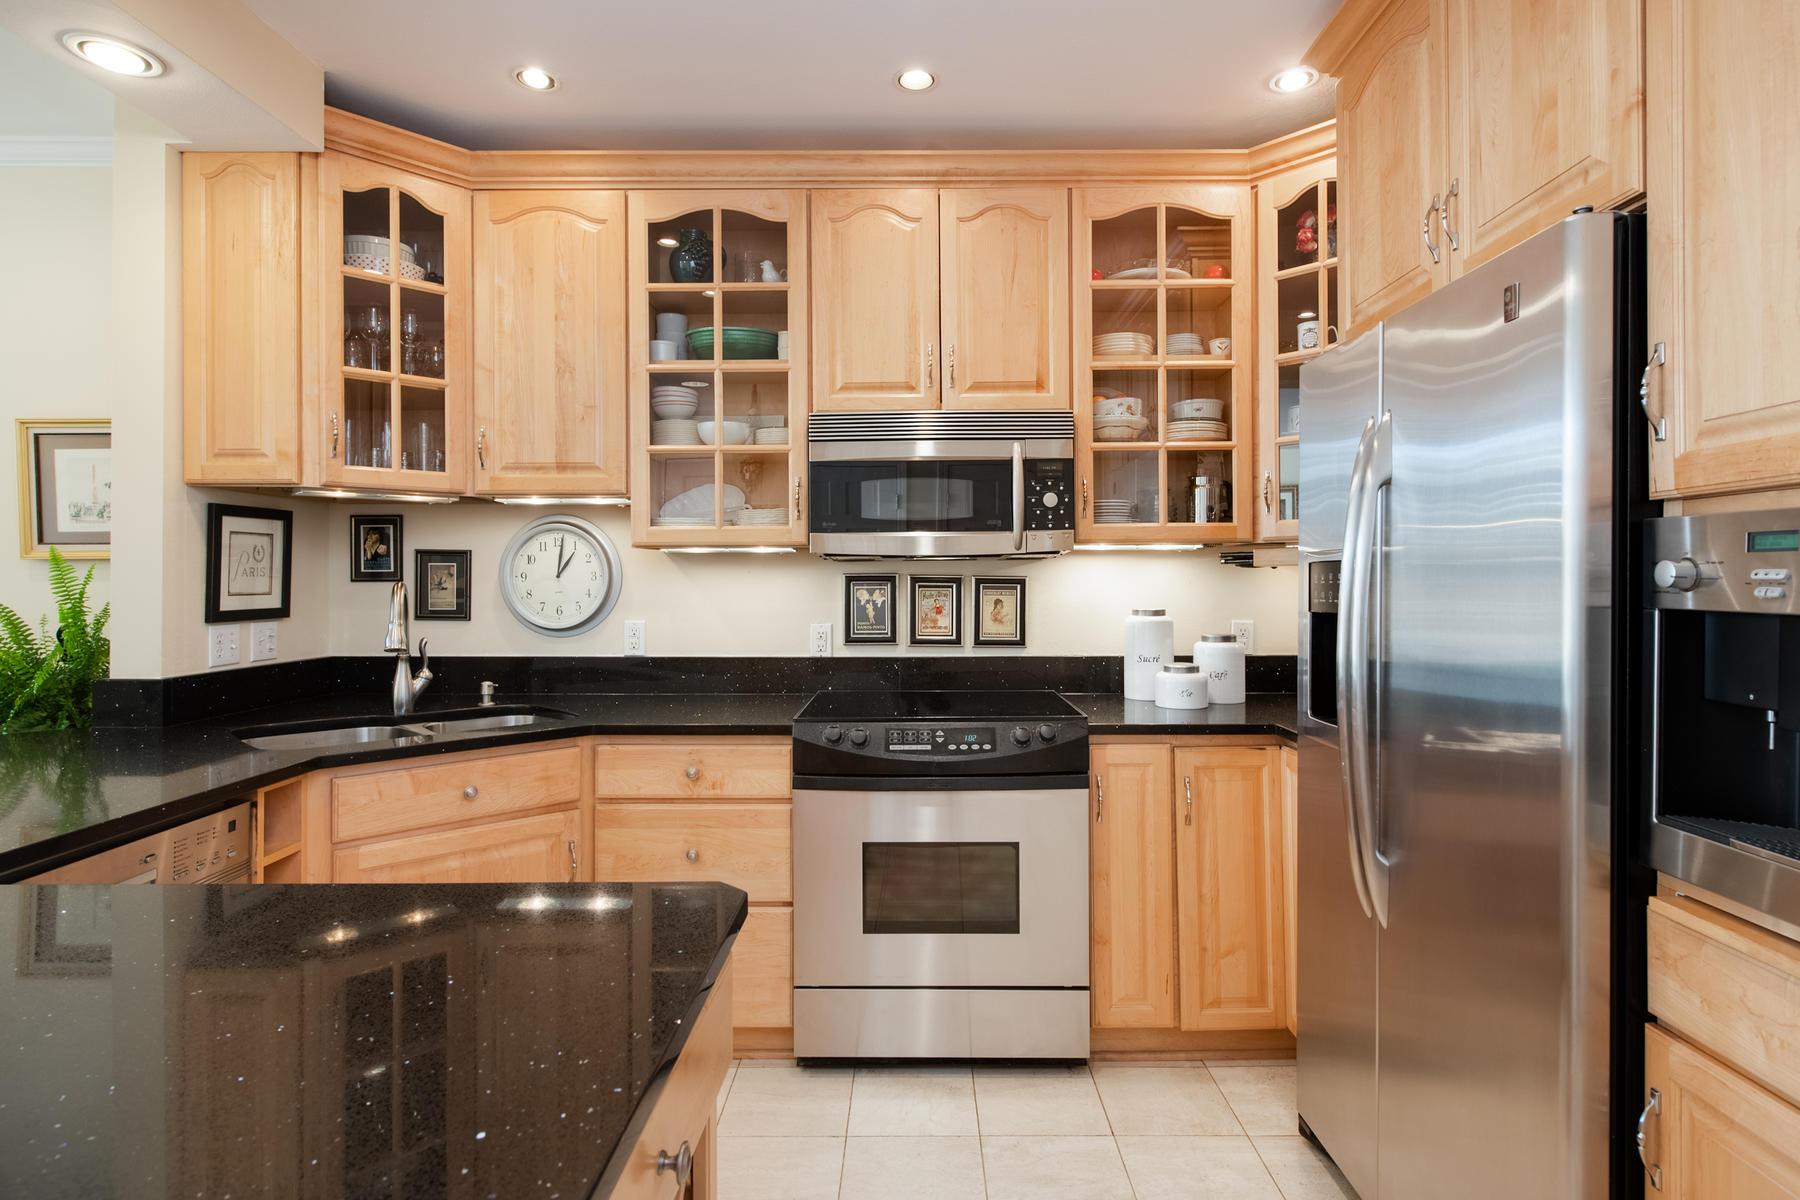 Additional photo for property listing at 1512 Larimer Street #27 1512 Larimer Street #27 Denver, Colorado 80202 United States